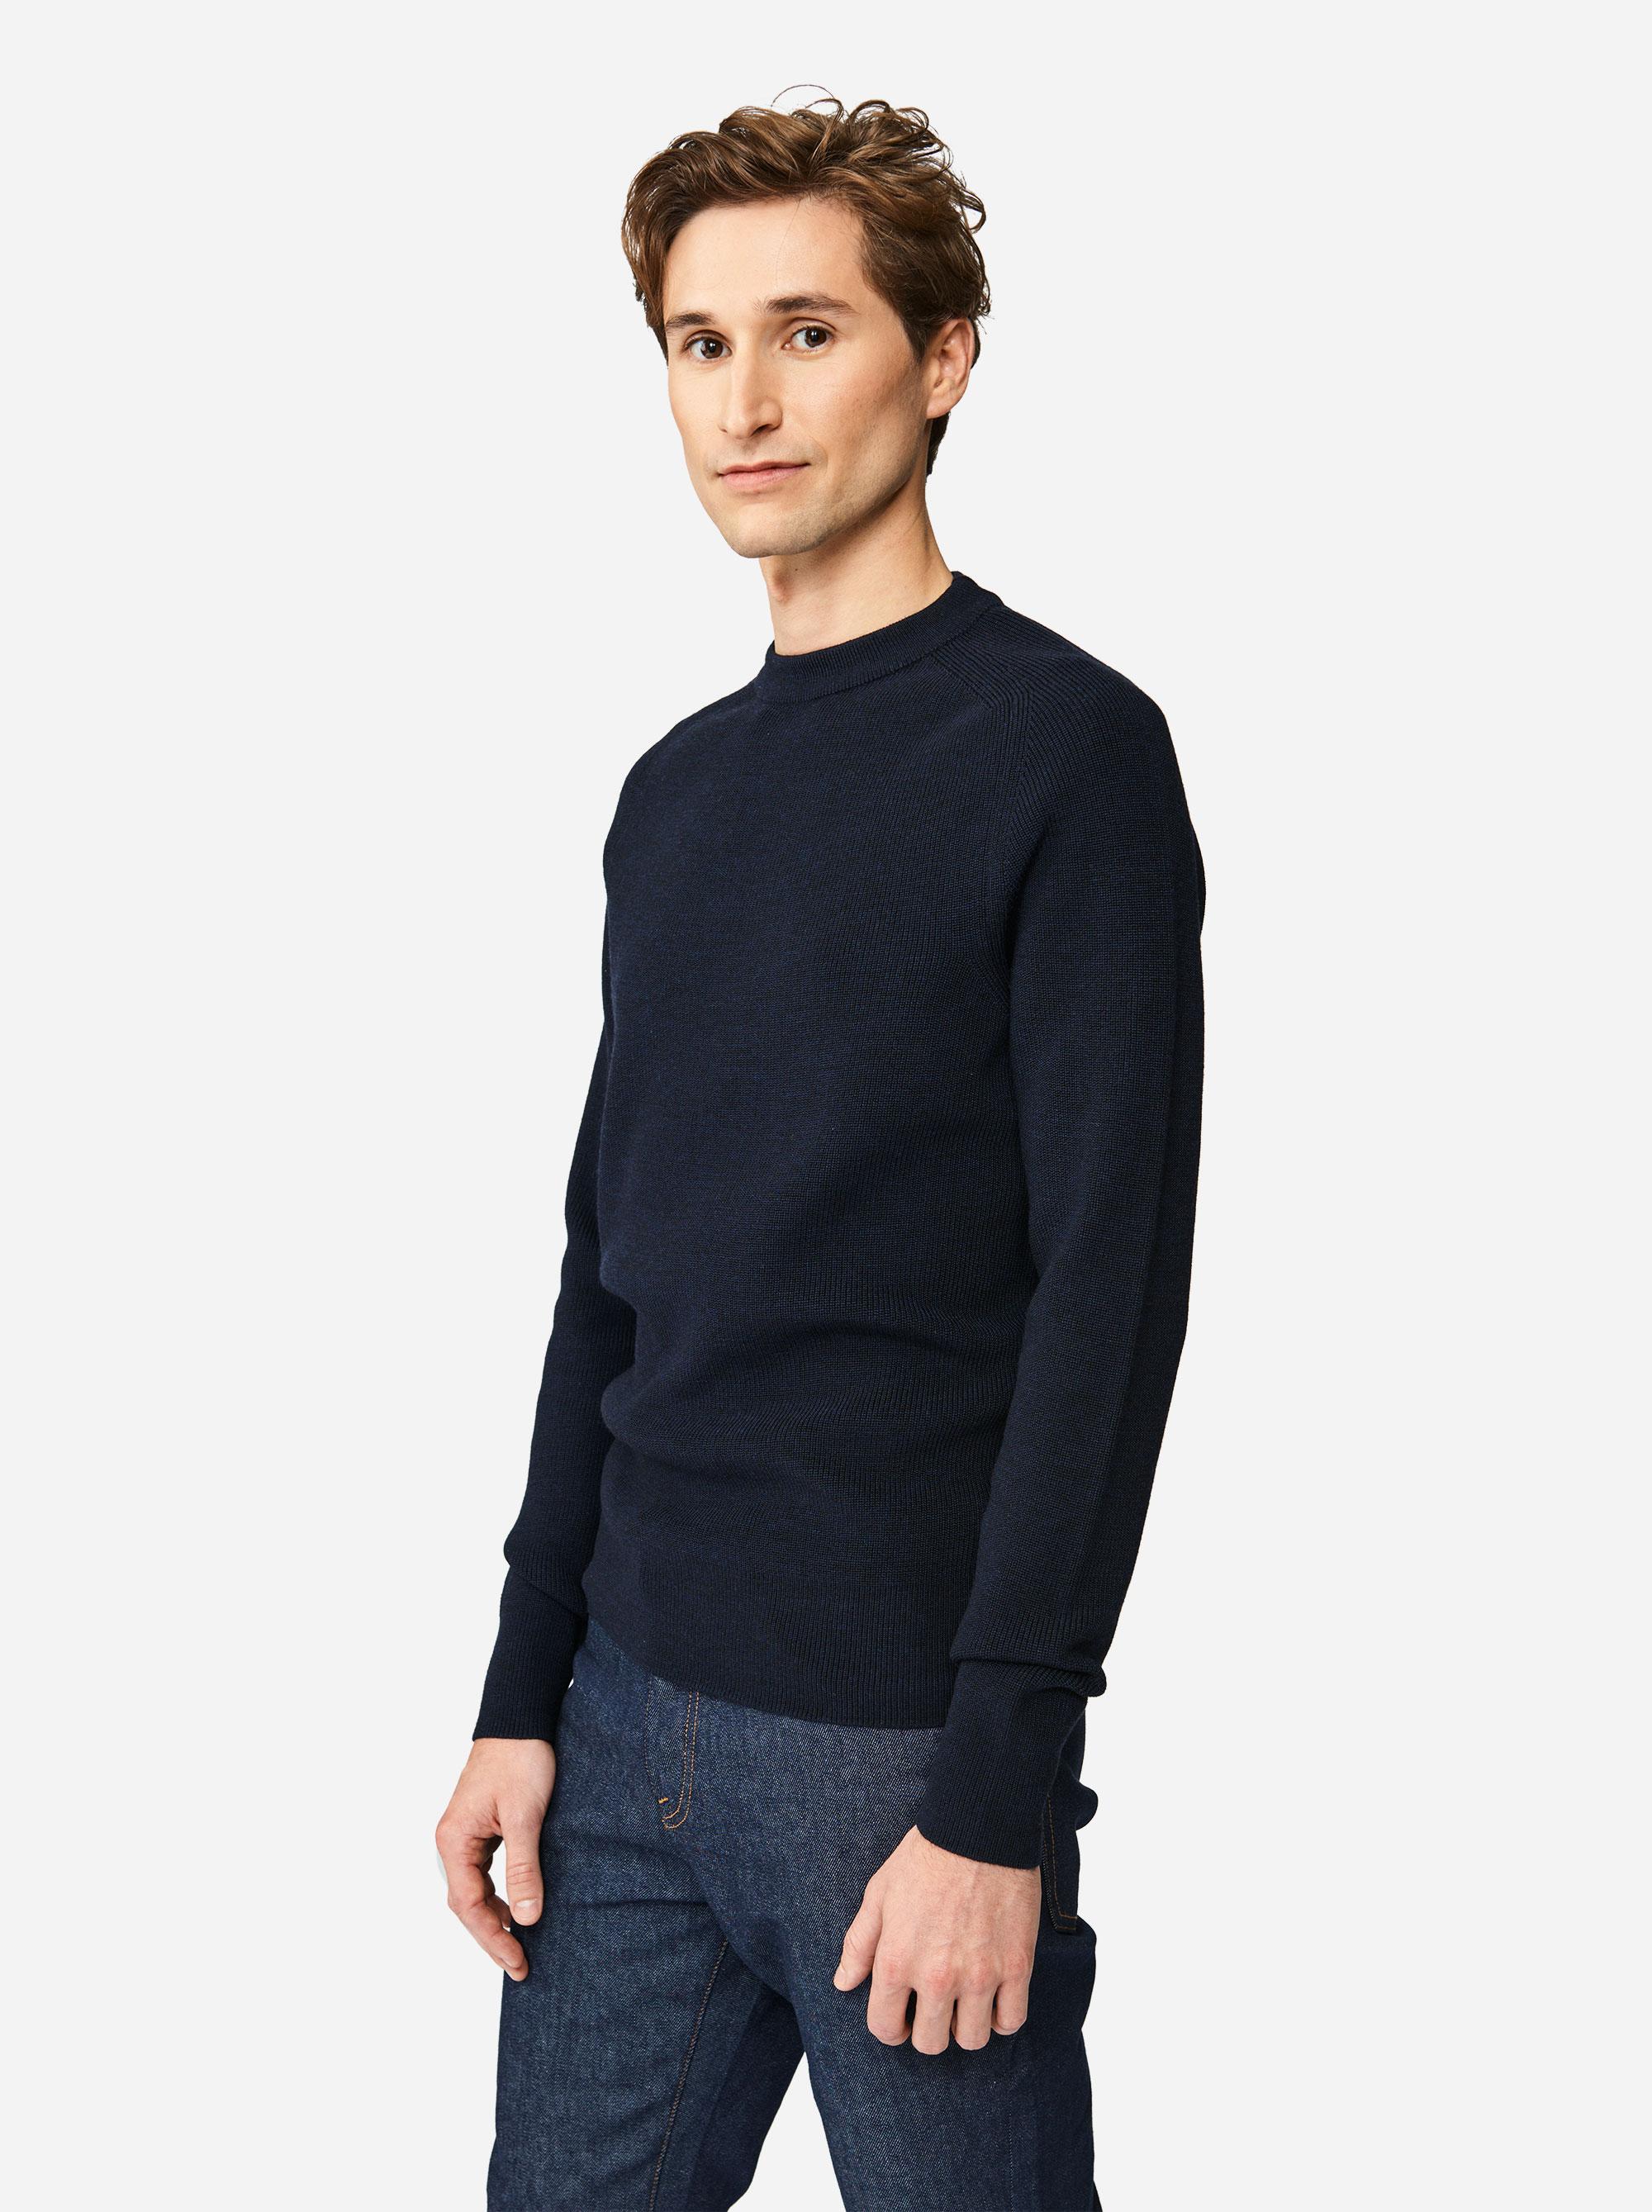 Teym - The Merino Sweater - Men - Blue - 2